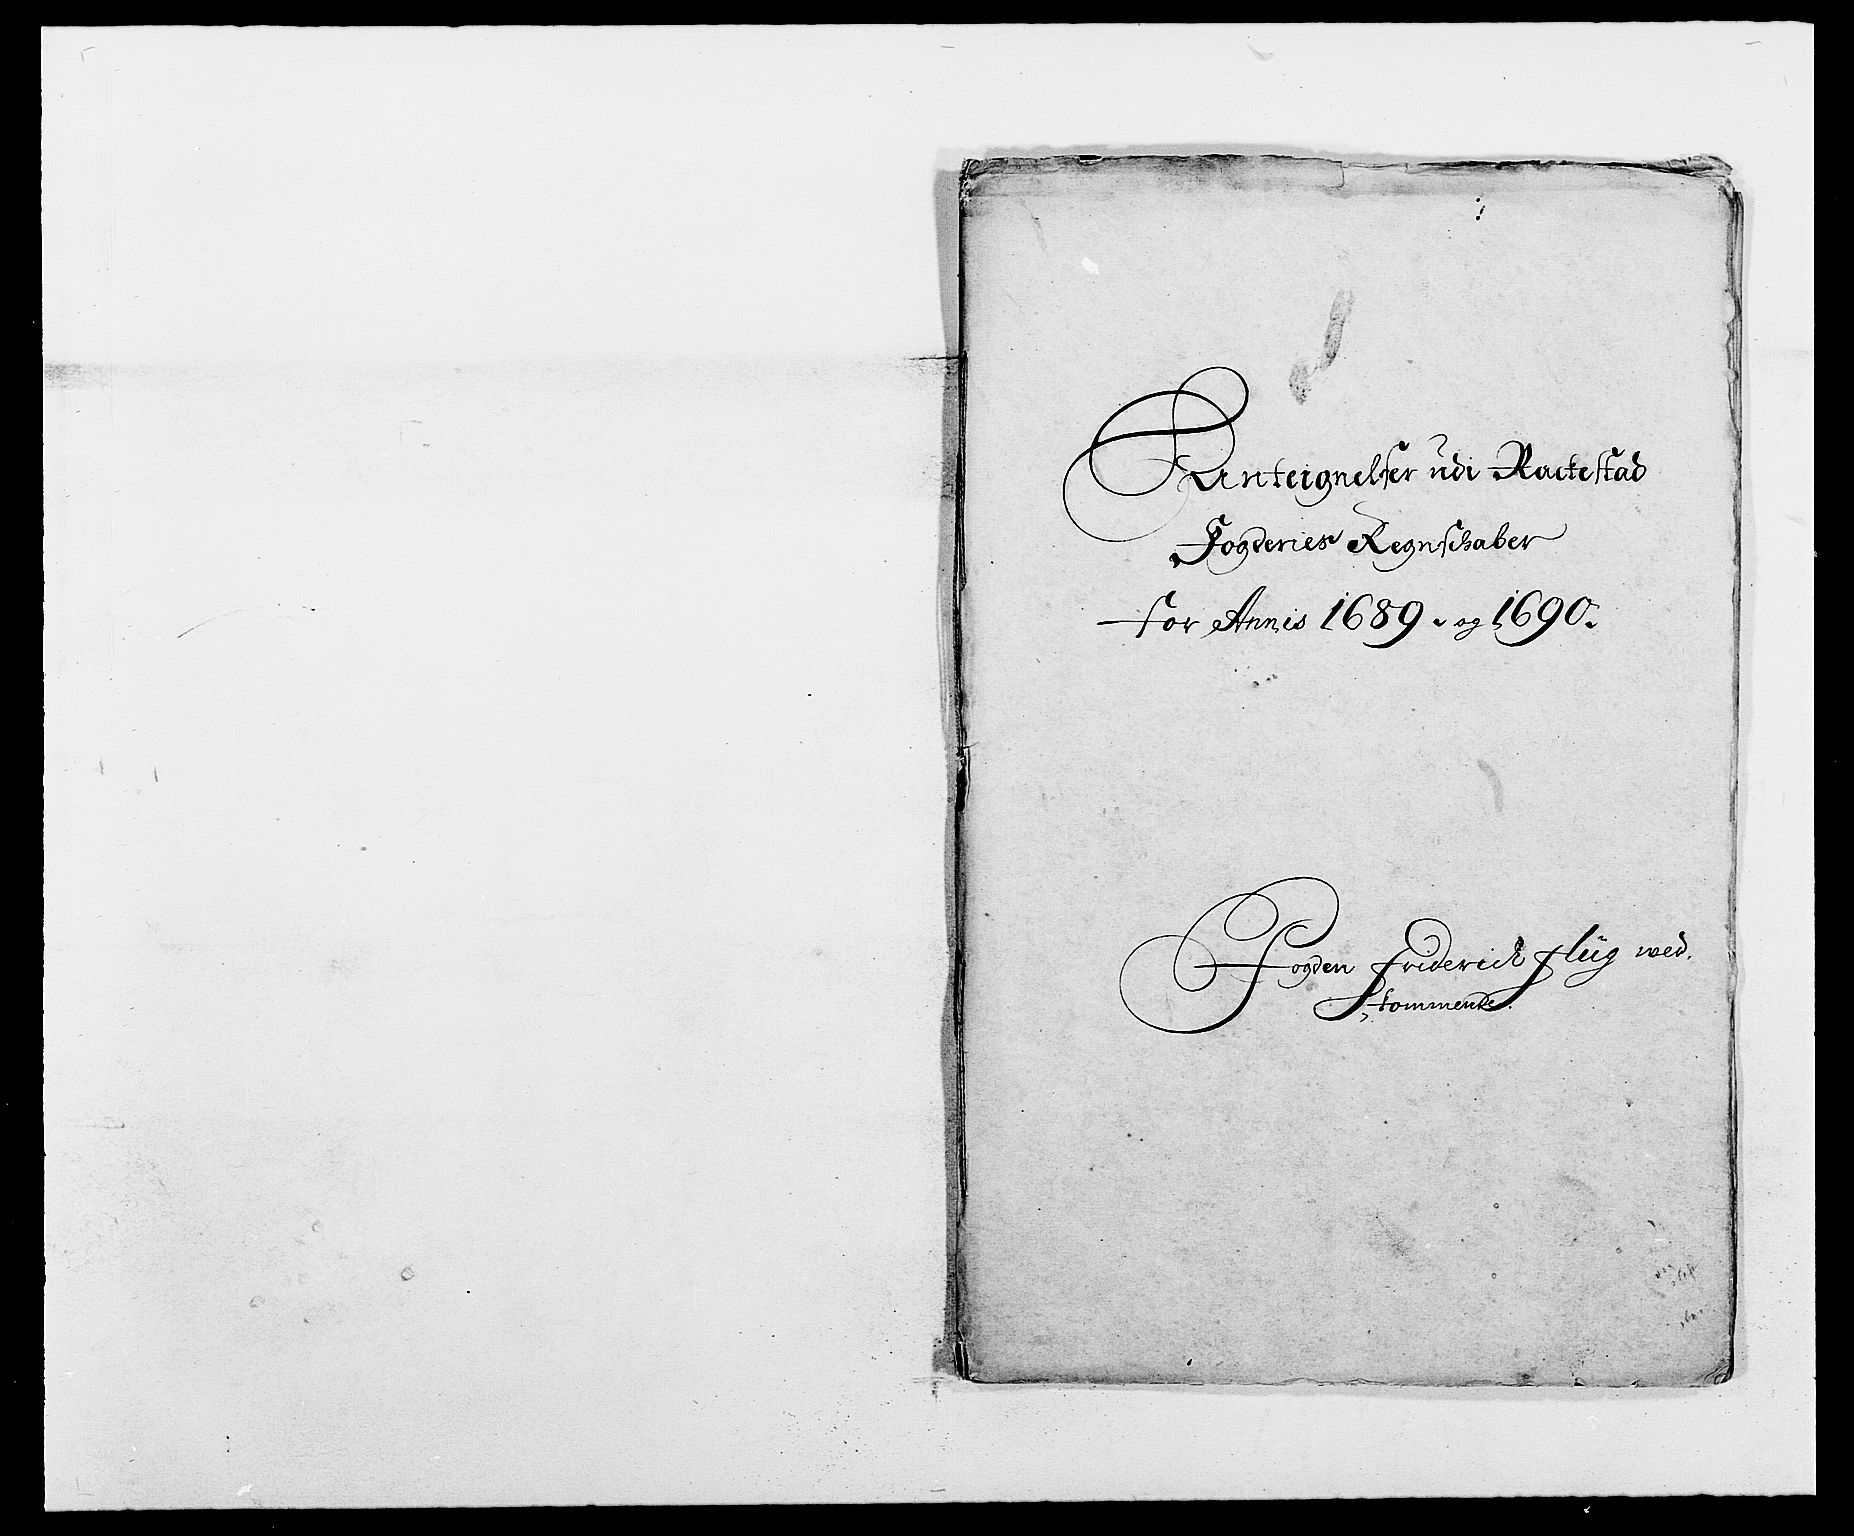 RA, Rentekammeret inntil 1814, Reviderte regnskaper, Fogderegnskap, R05/L0277: Fogderegnskap Rakkestad, 1689-1690, s. 383